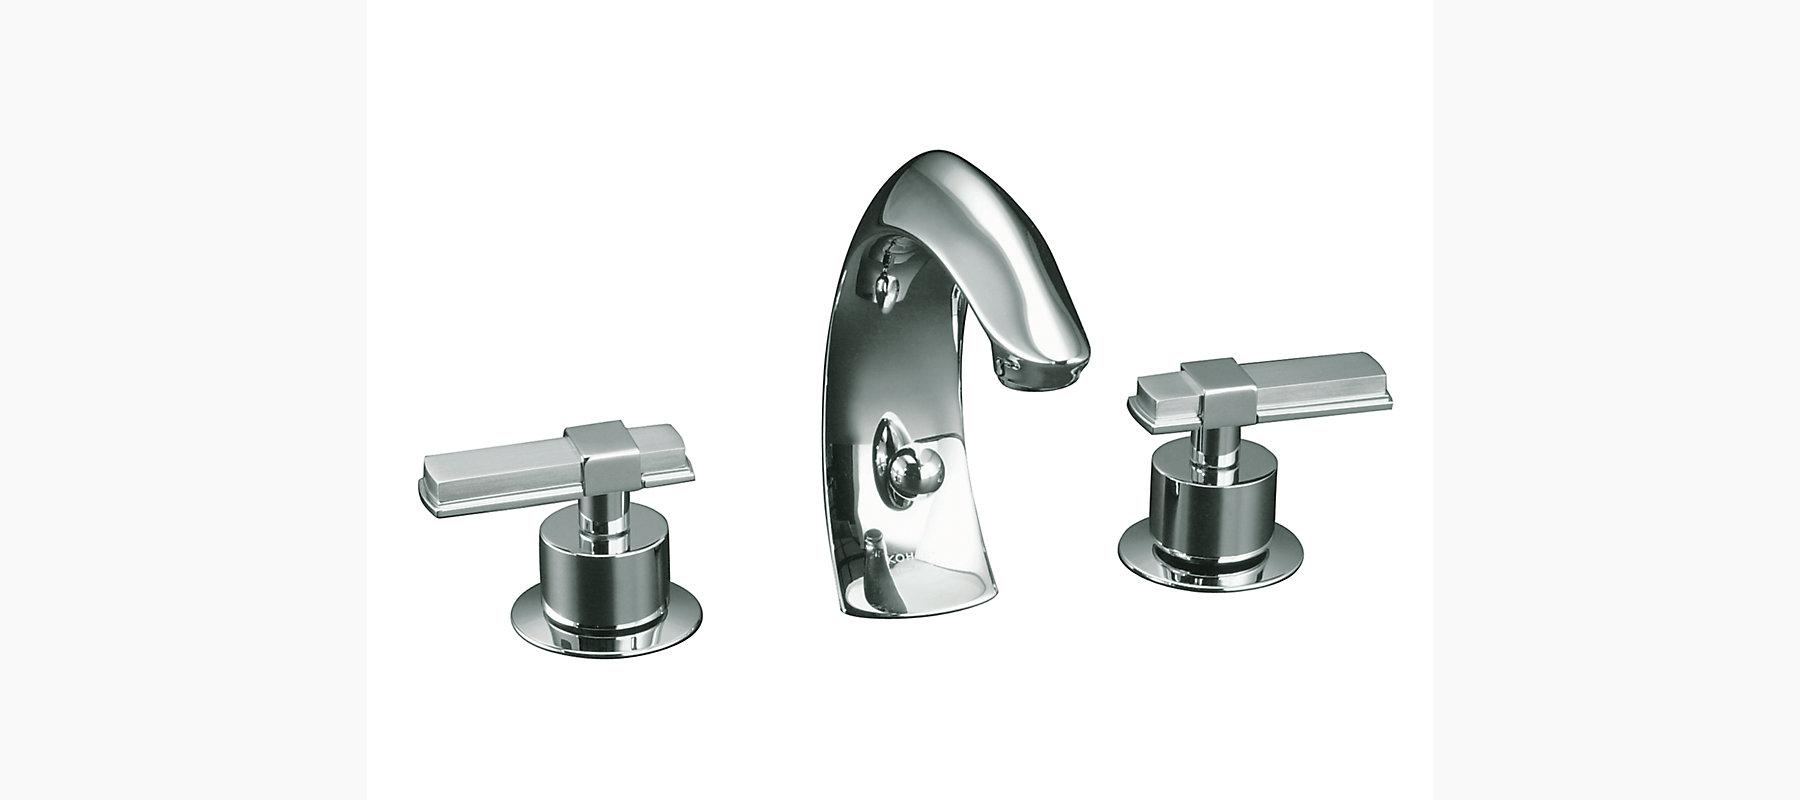 Kohler Elmbrook 8 In Widespread 2 Handle Bathroom Faucet: KOHLER